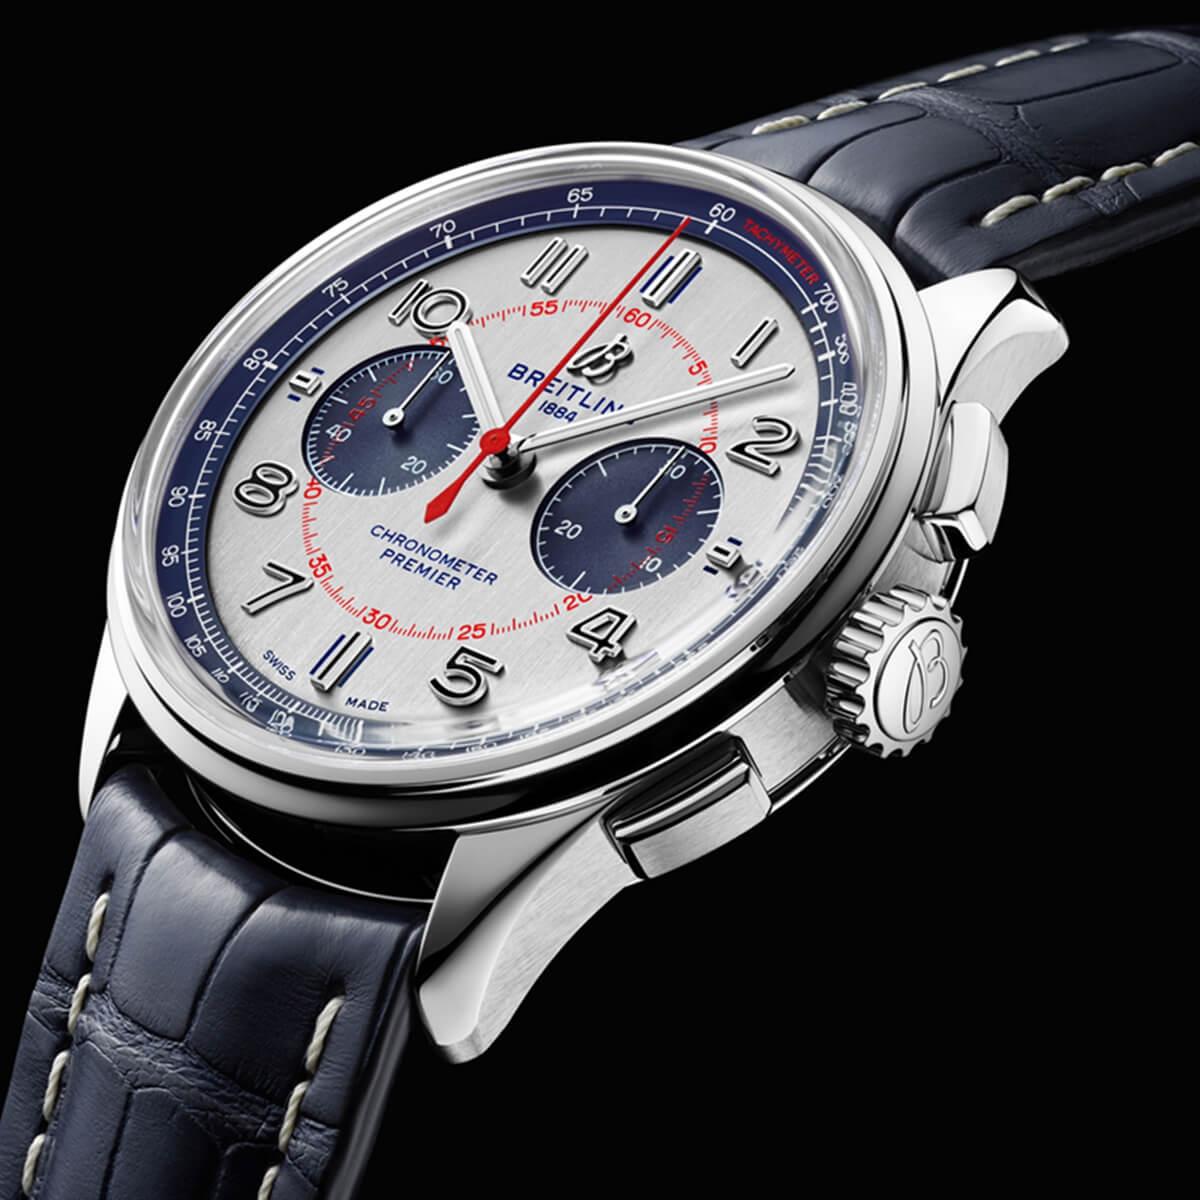 Breitling-Bentley-Mulliner-watch-4.jpg